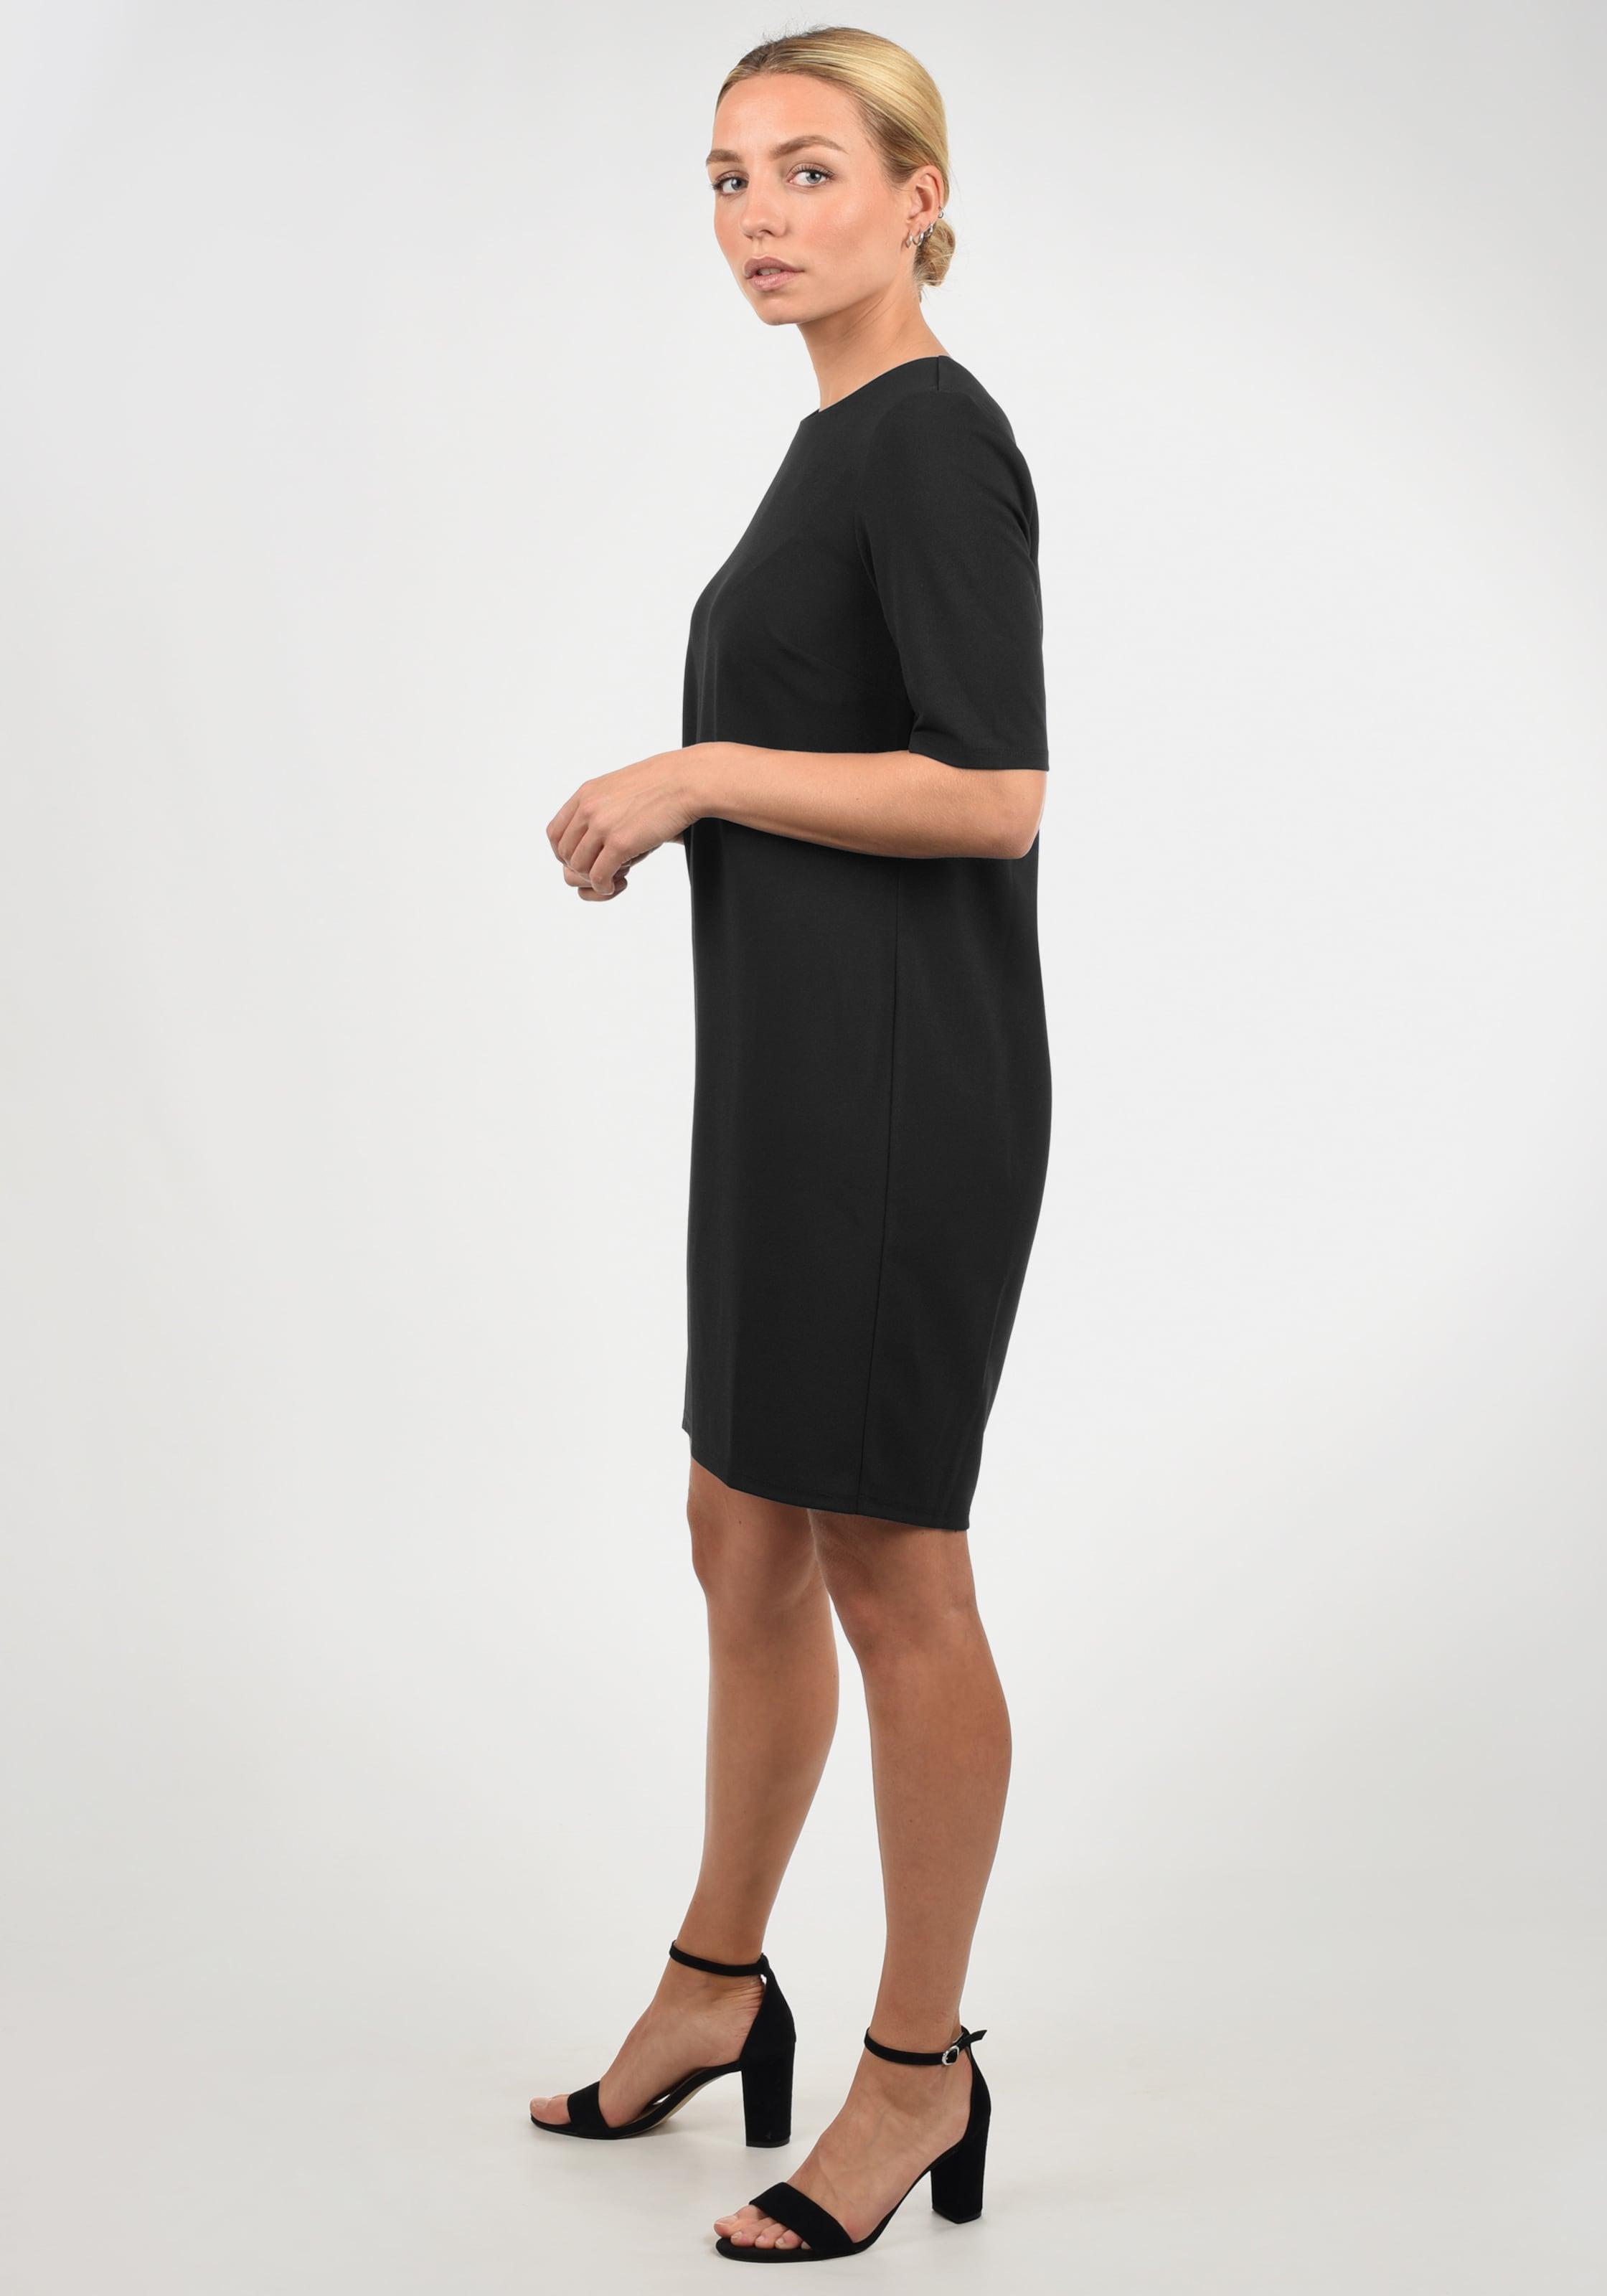 De Kleid Jacqueline Yong 'estelle' Schwarz In vmNn08Ow